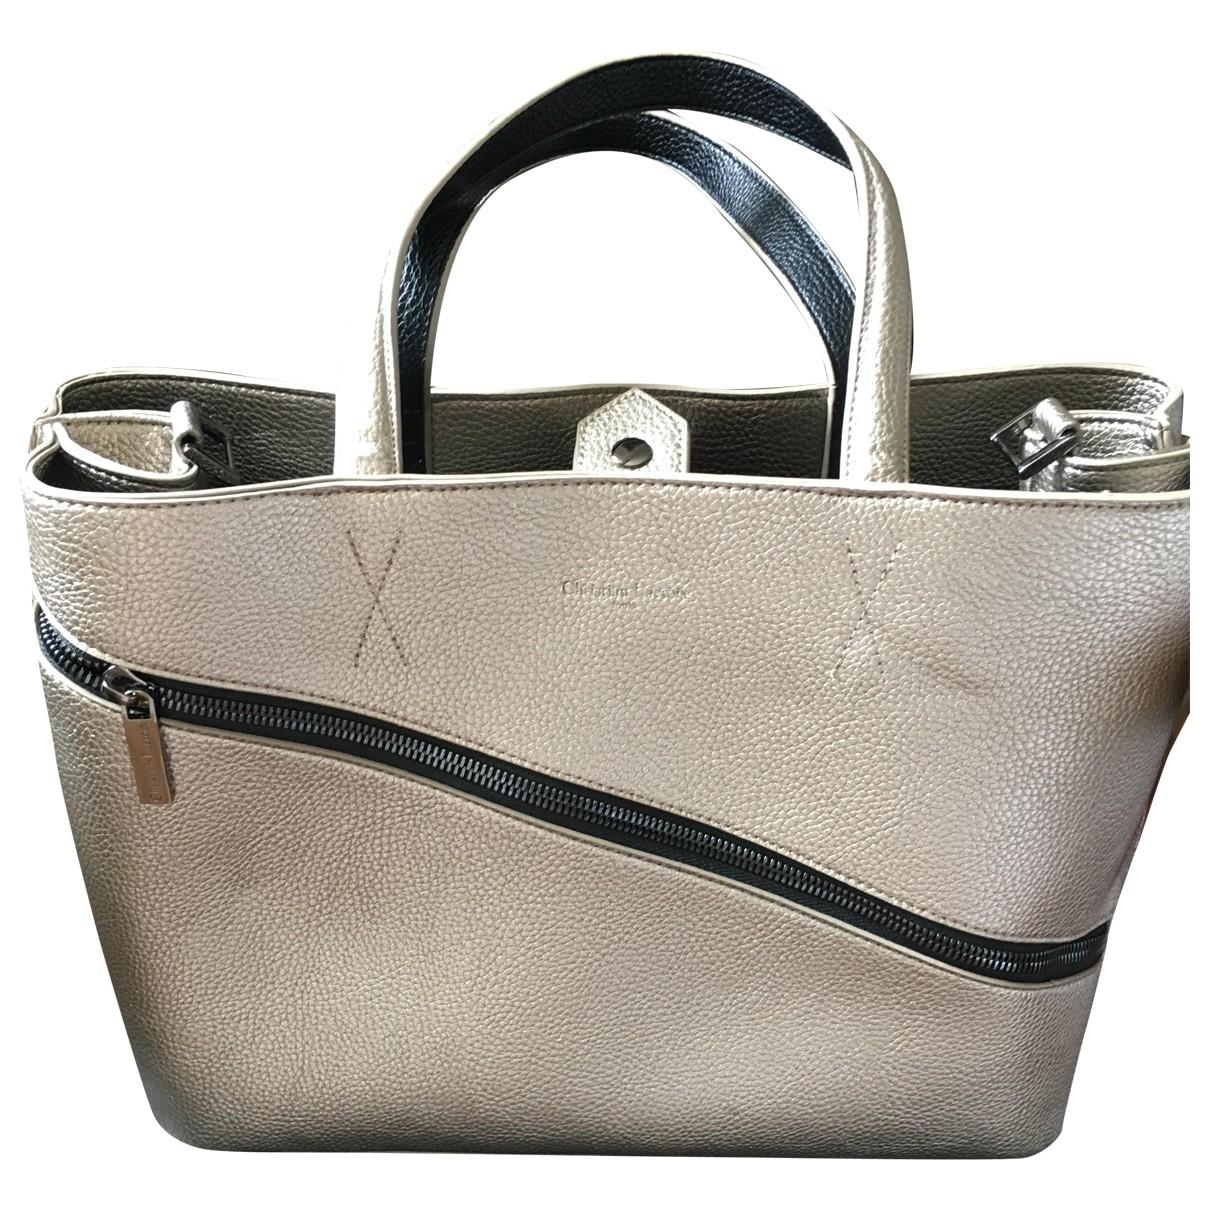 Christian Lacroix \N Metallic Leather handbag for Women \N